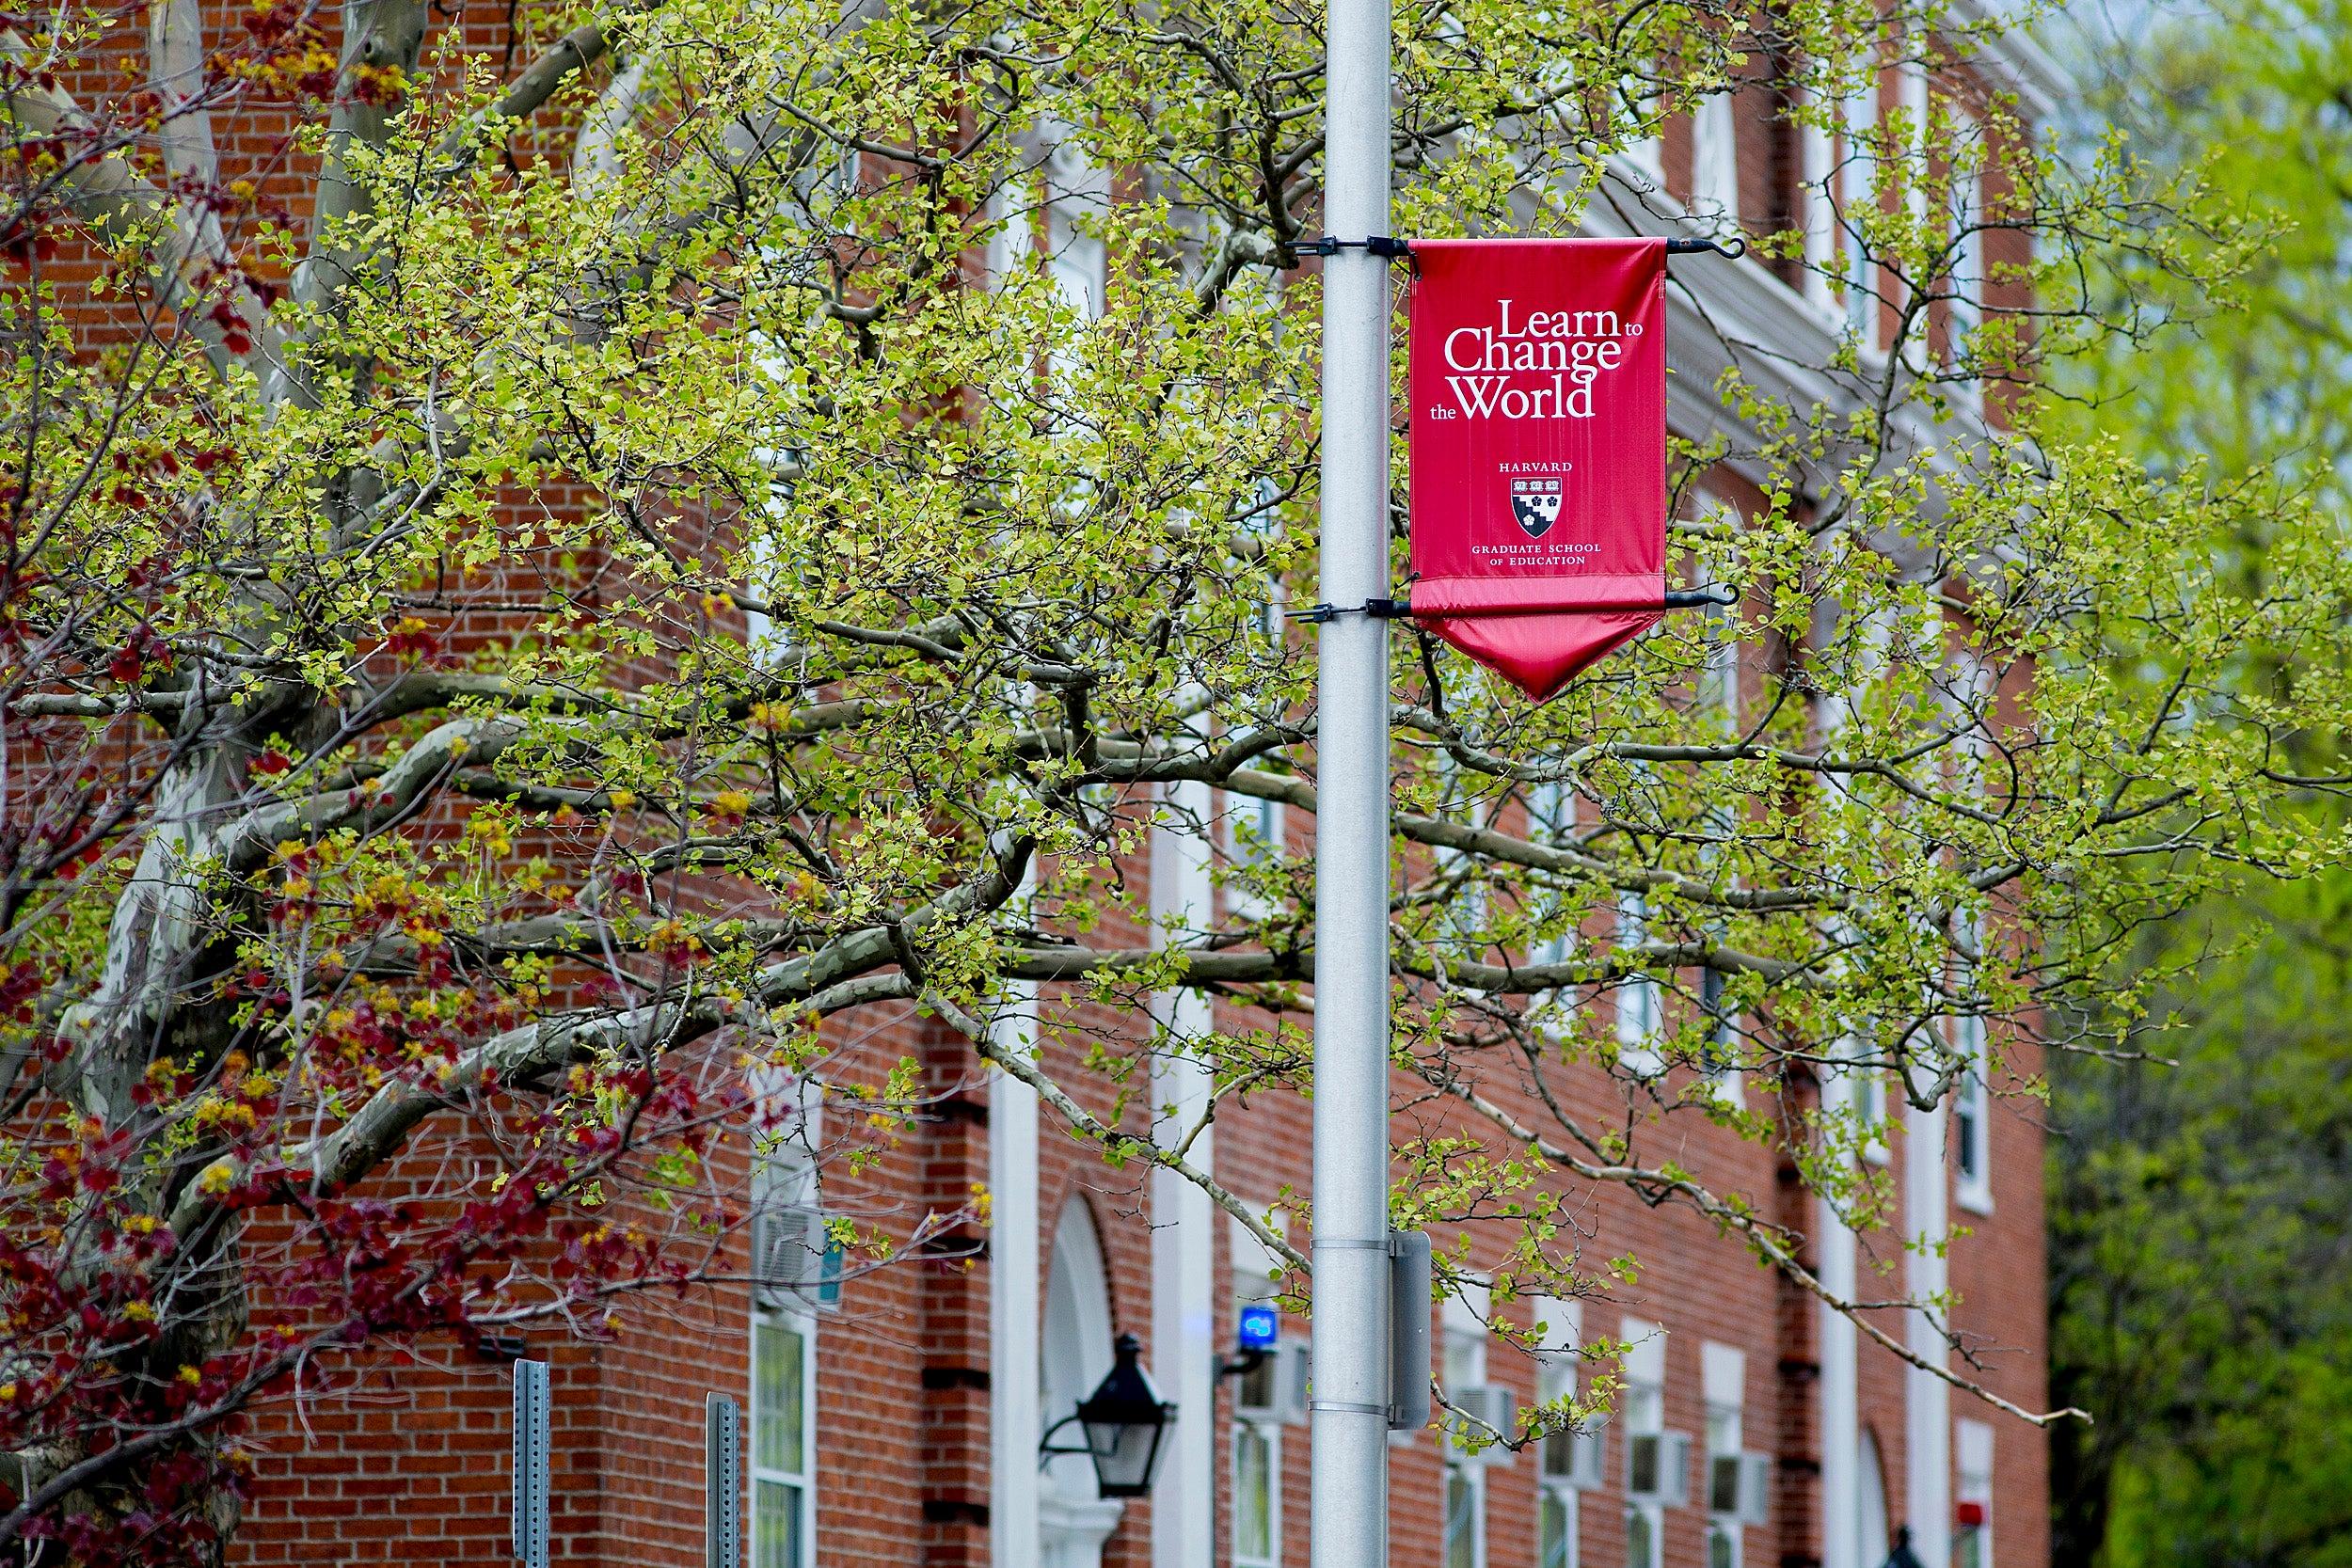 Graduate School of Education